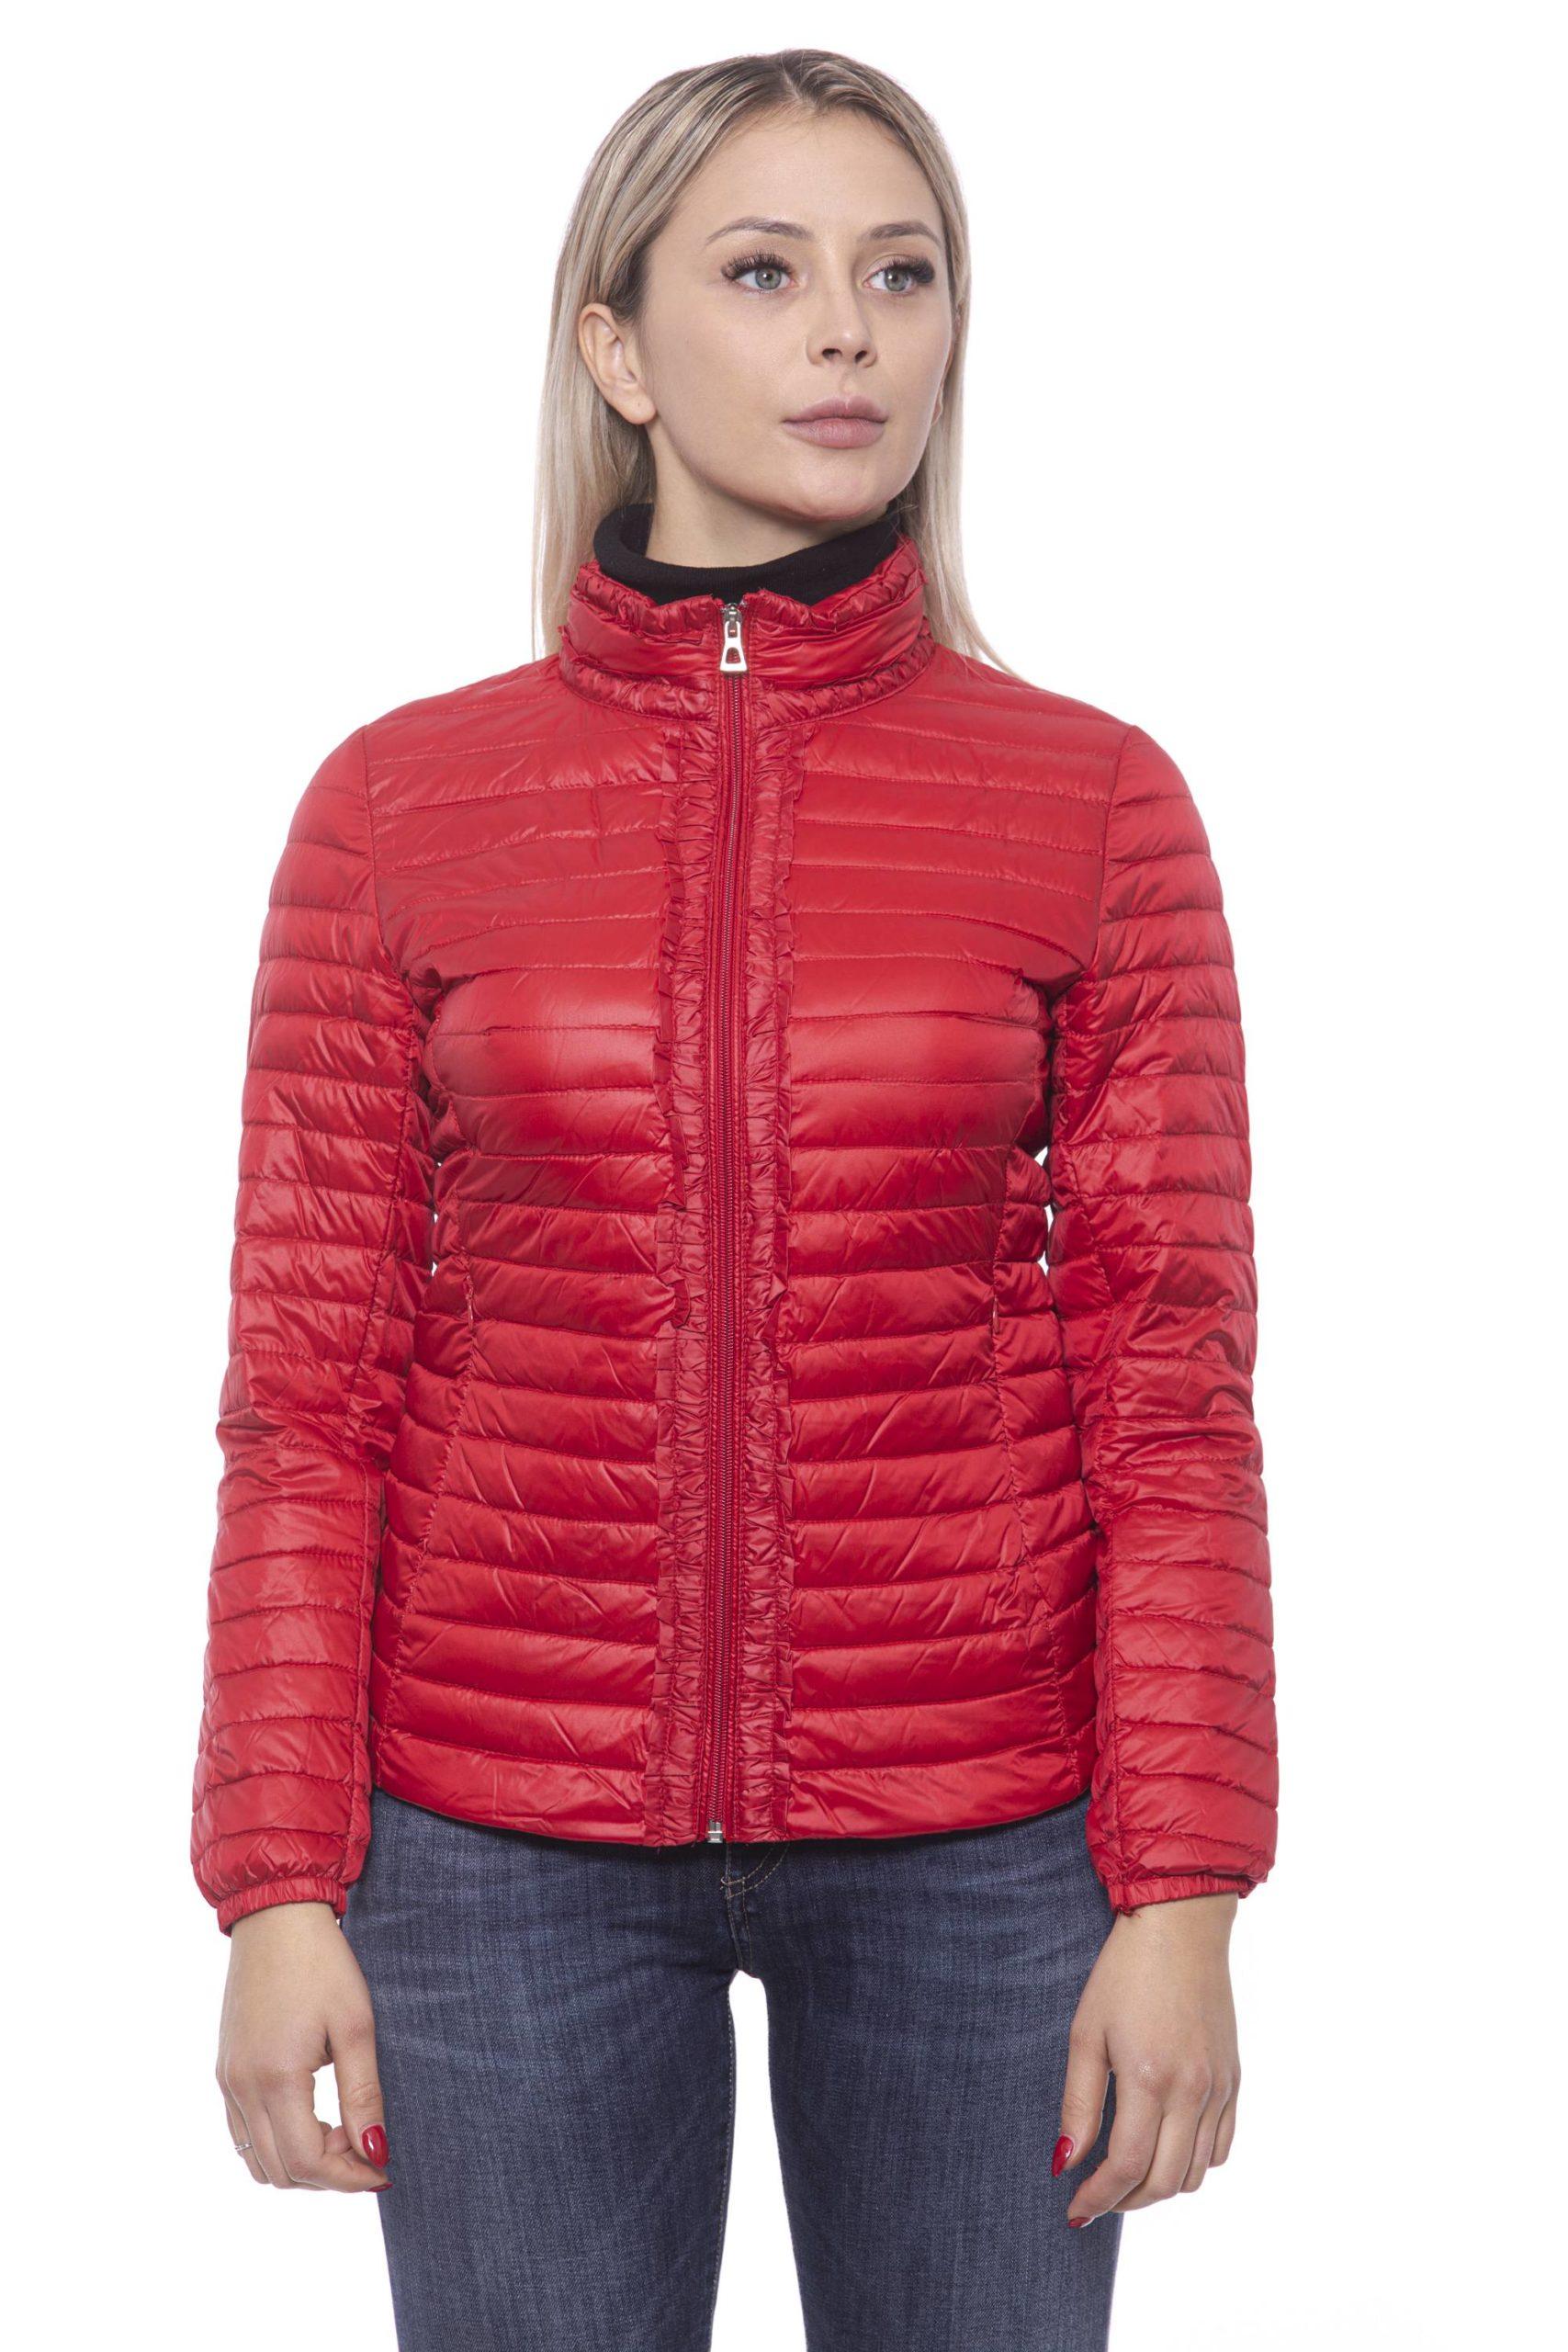 19V69 Italia Women's Rosso Jacket Red 191388368 - S